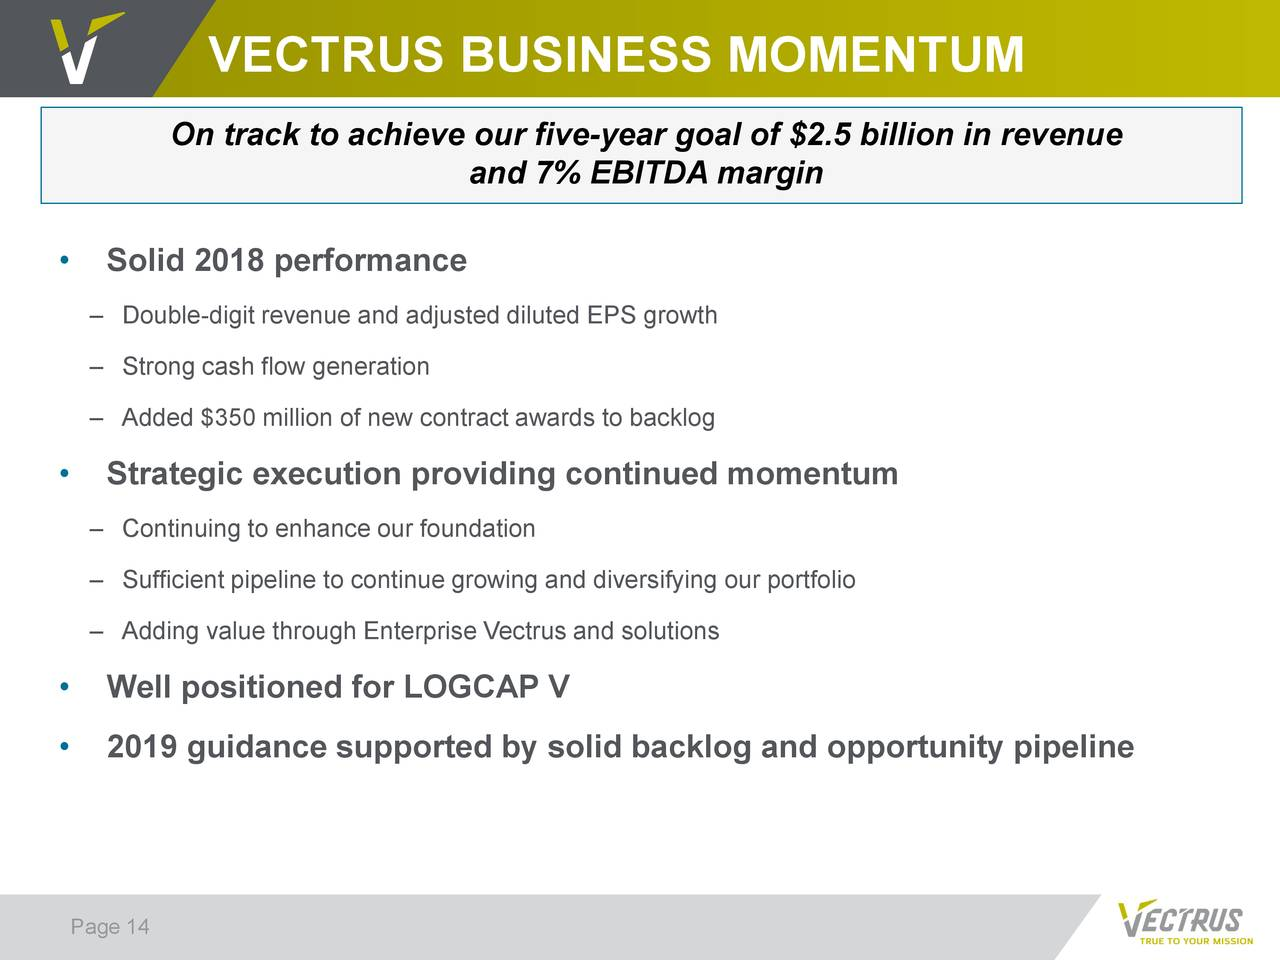 Vectrus 2018 Q4 - Results - Earnings Call Slides - Vectrus, Inc